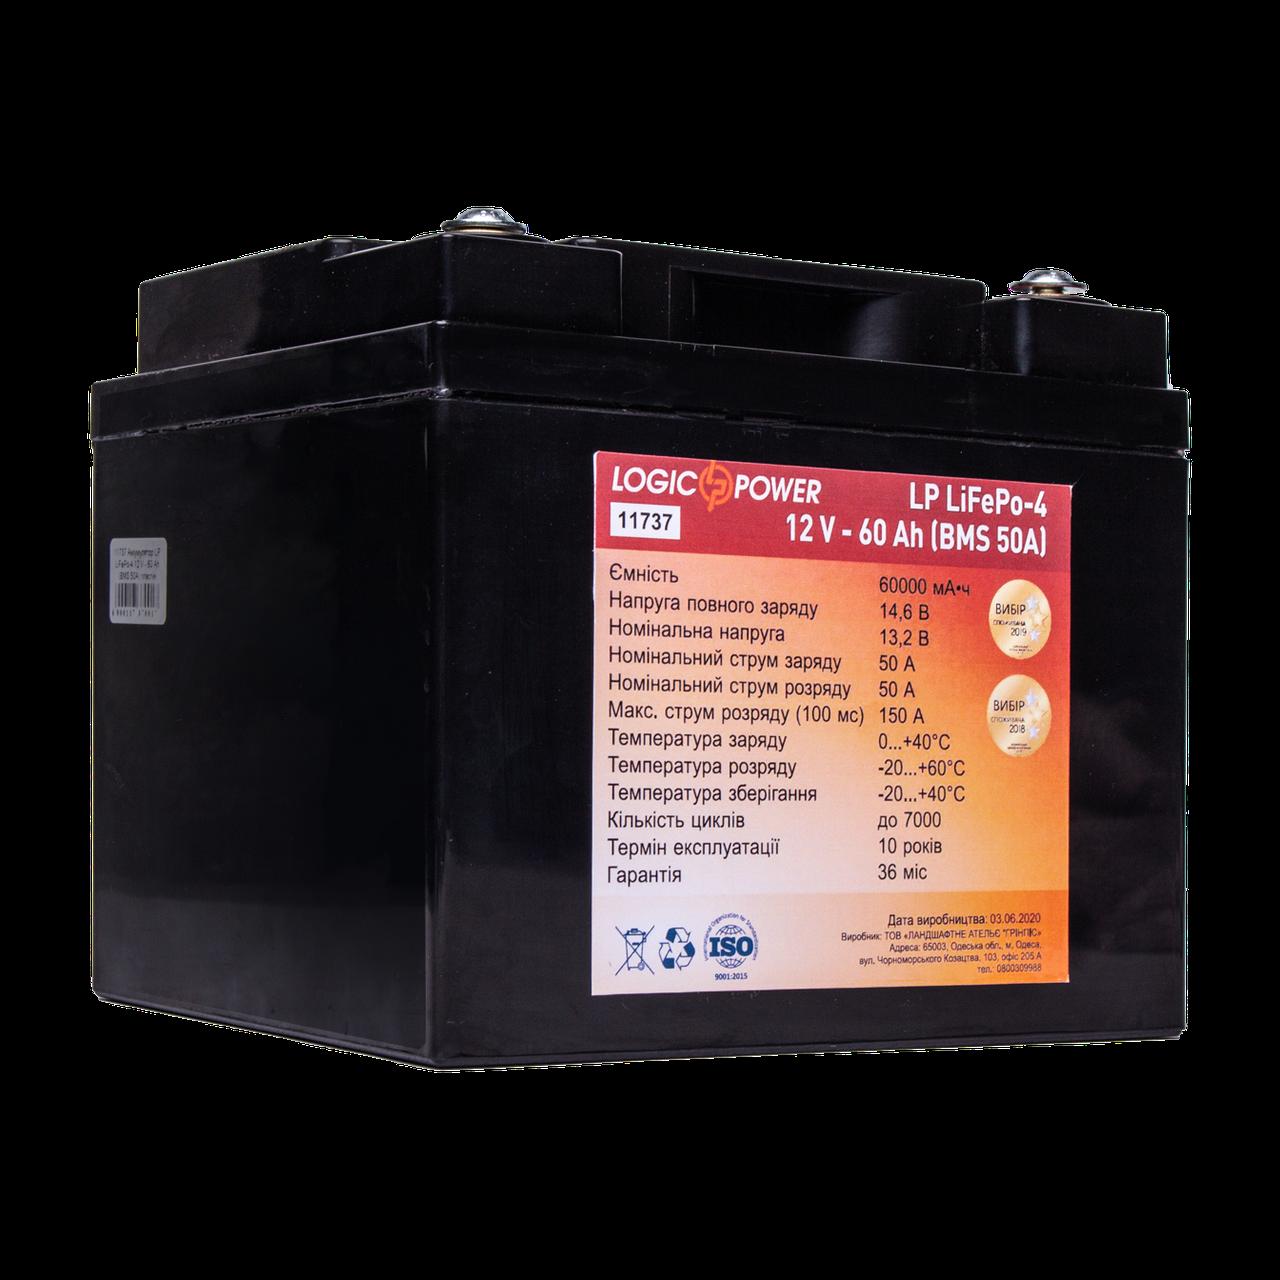 Аккумуляторная батарея LP LiFePo-4 12 V - 60 Ah BMS 50A пластик для солнечной электростанции